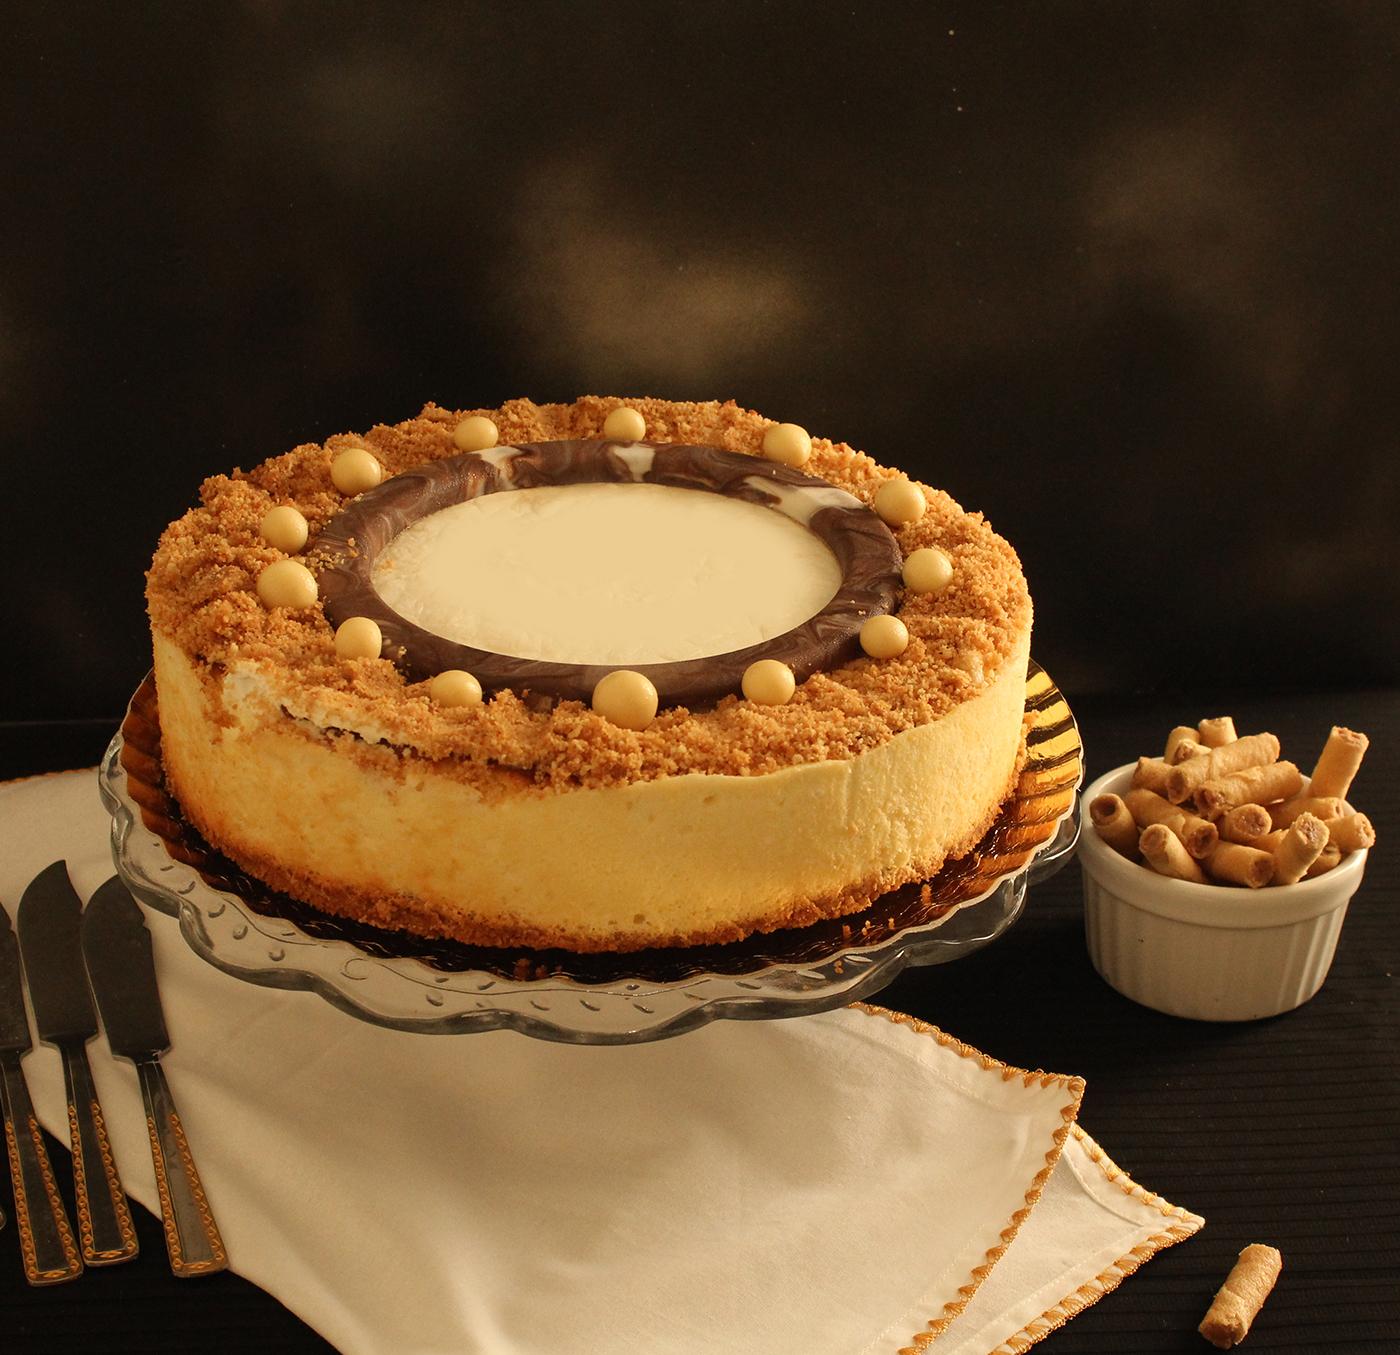 IMG 8229 - עוגת גבינה גבוהה וטעימה